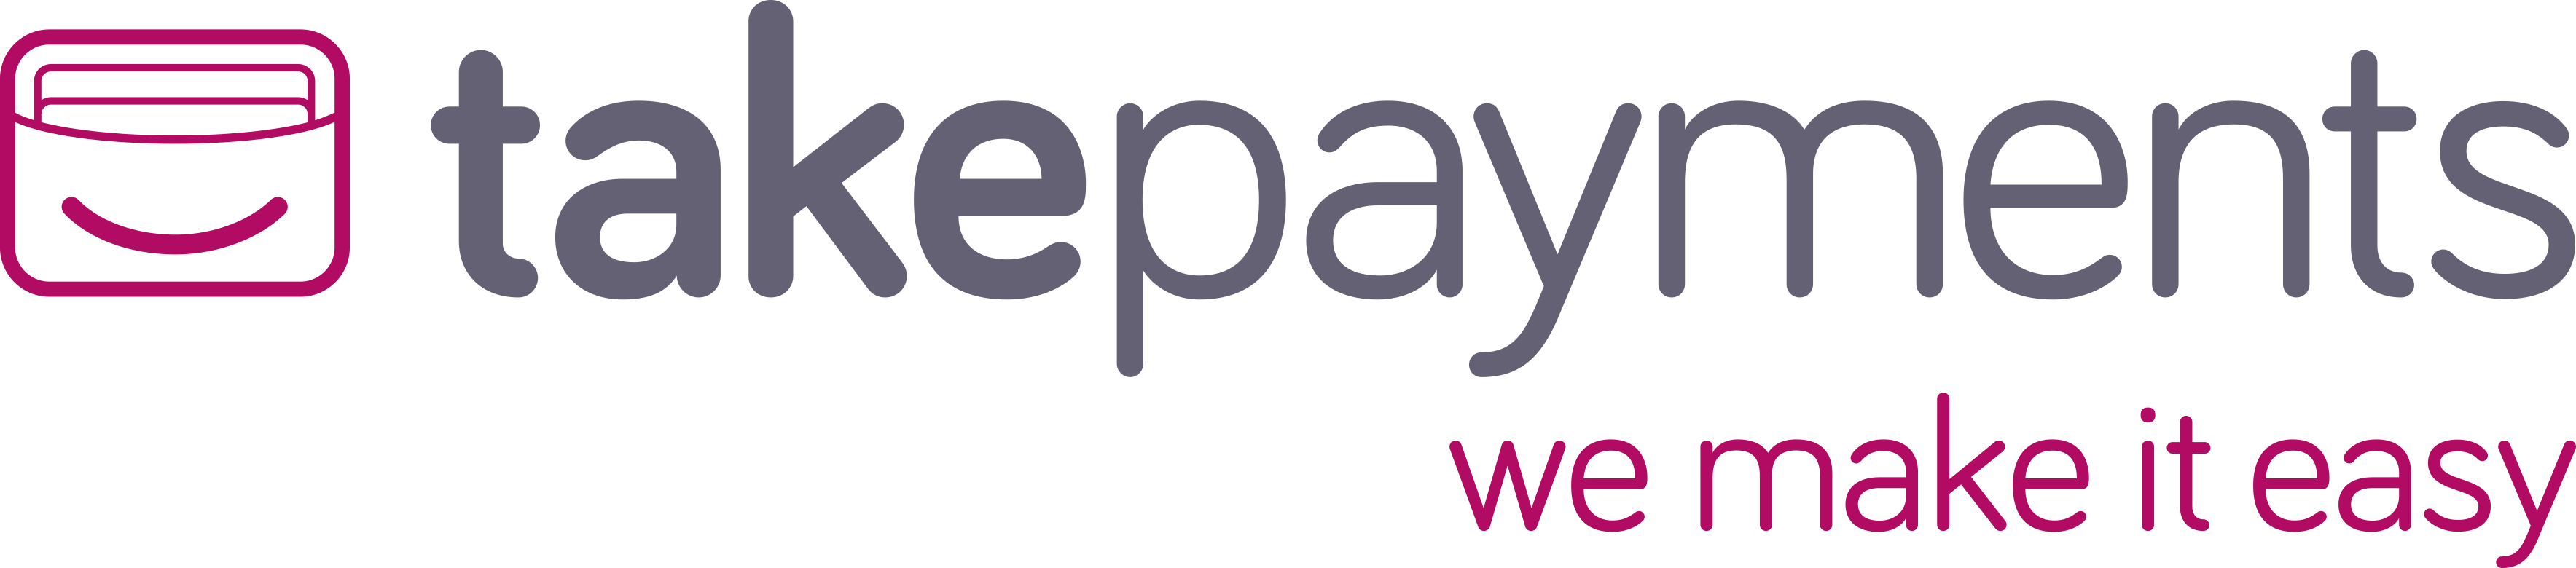 takepayments logo